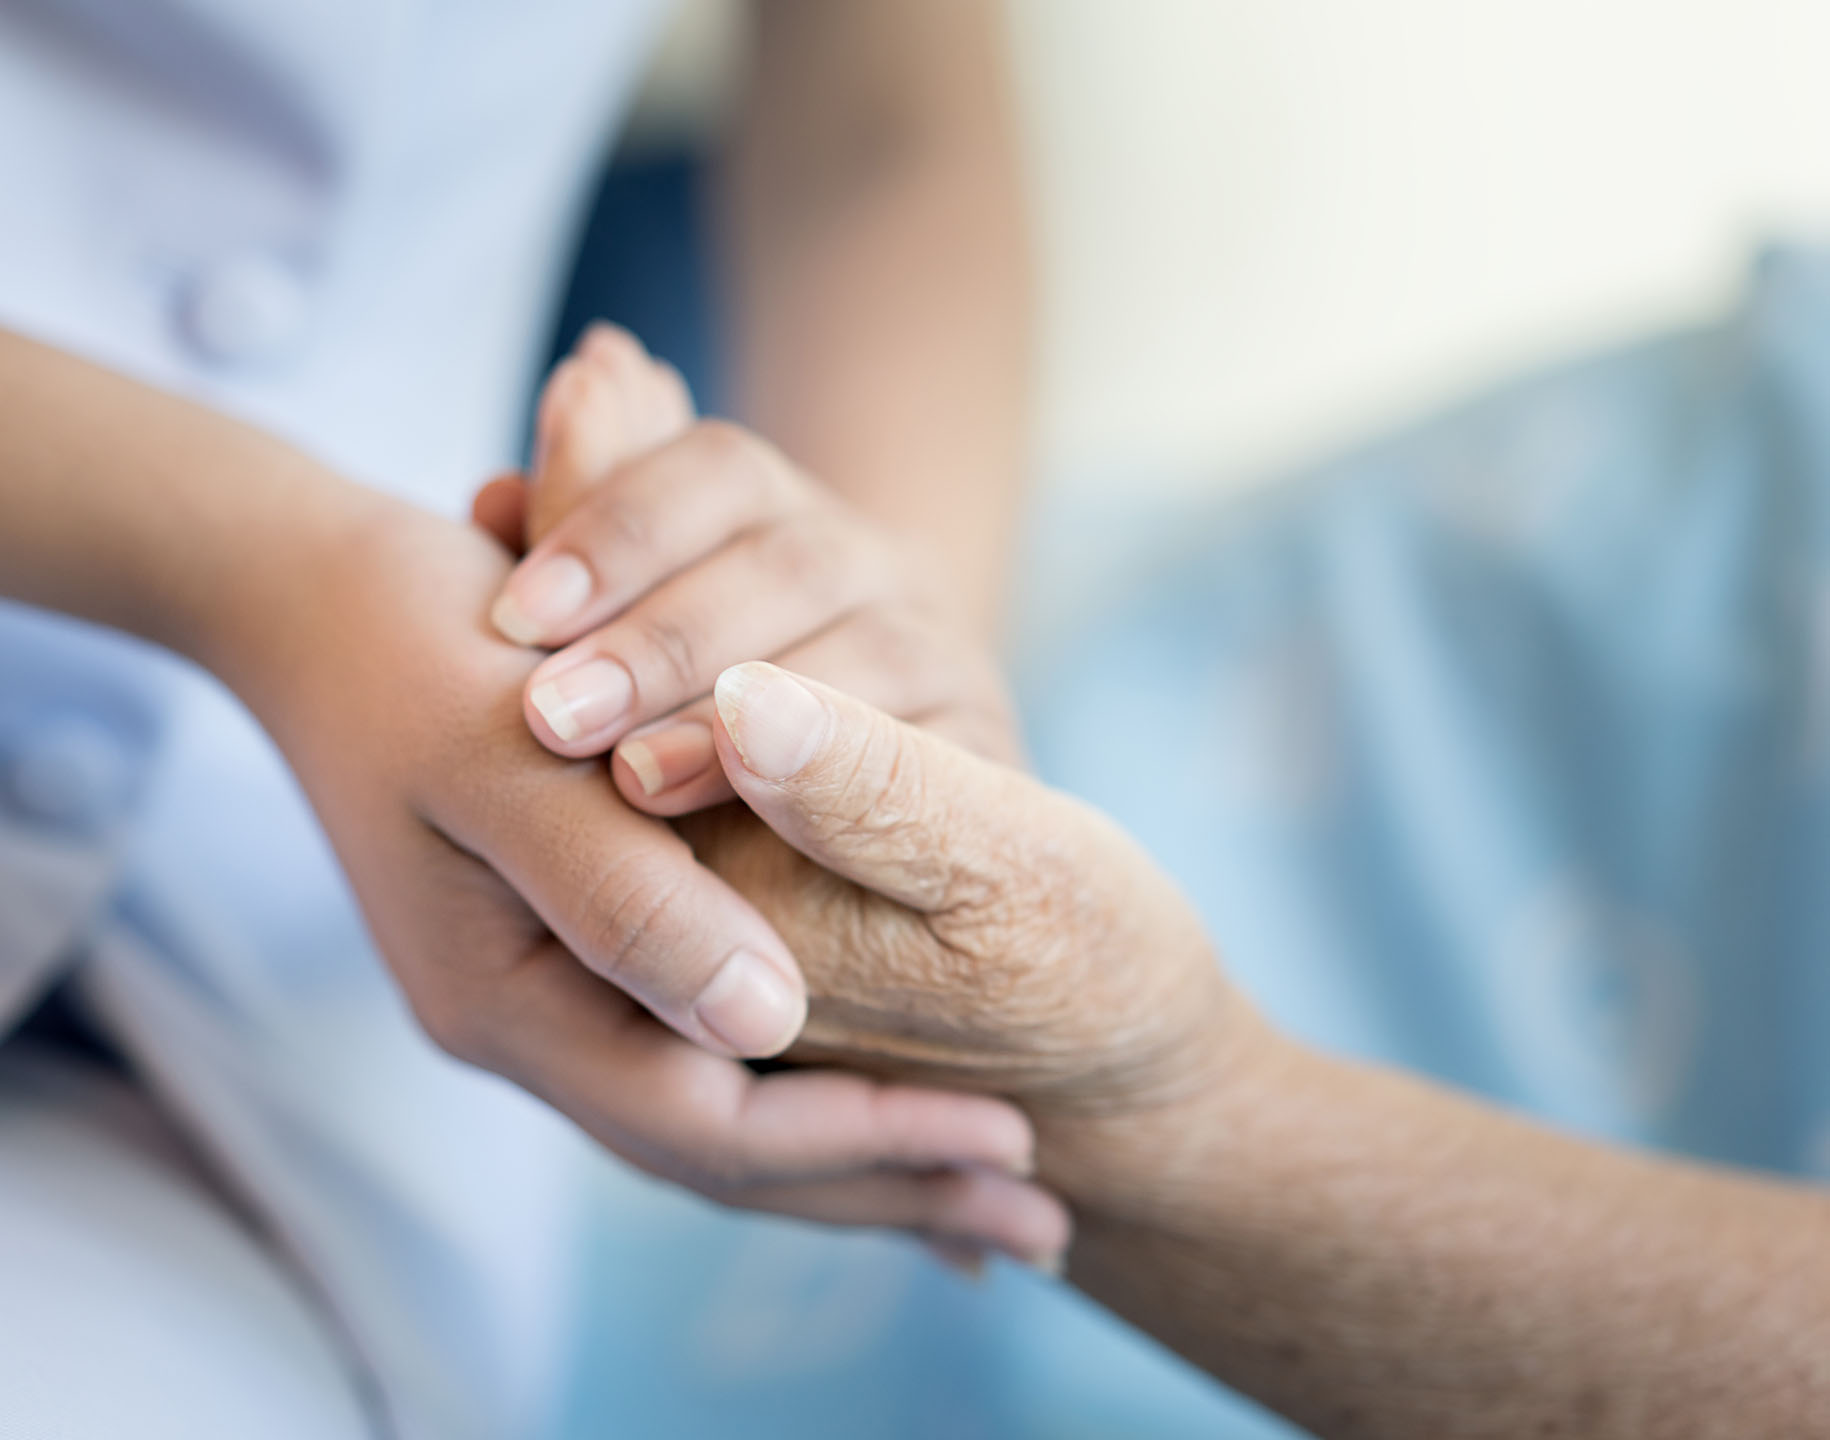 Nursing Home Elderly Wounds, Bruises, Injuries or Bleeding (Updated July 2021)